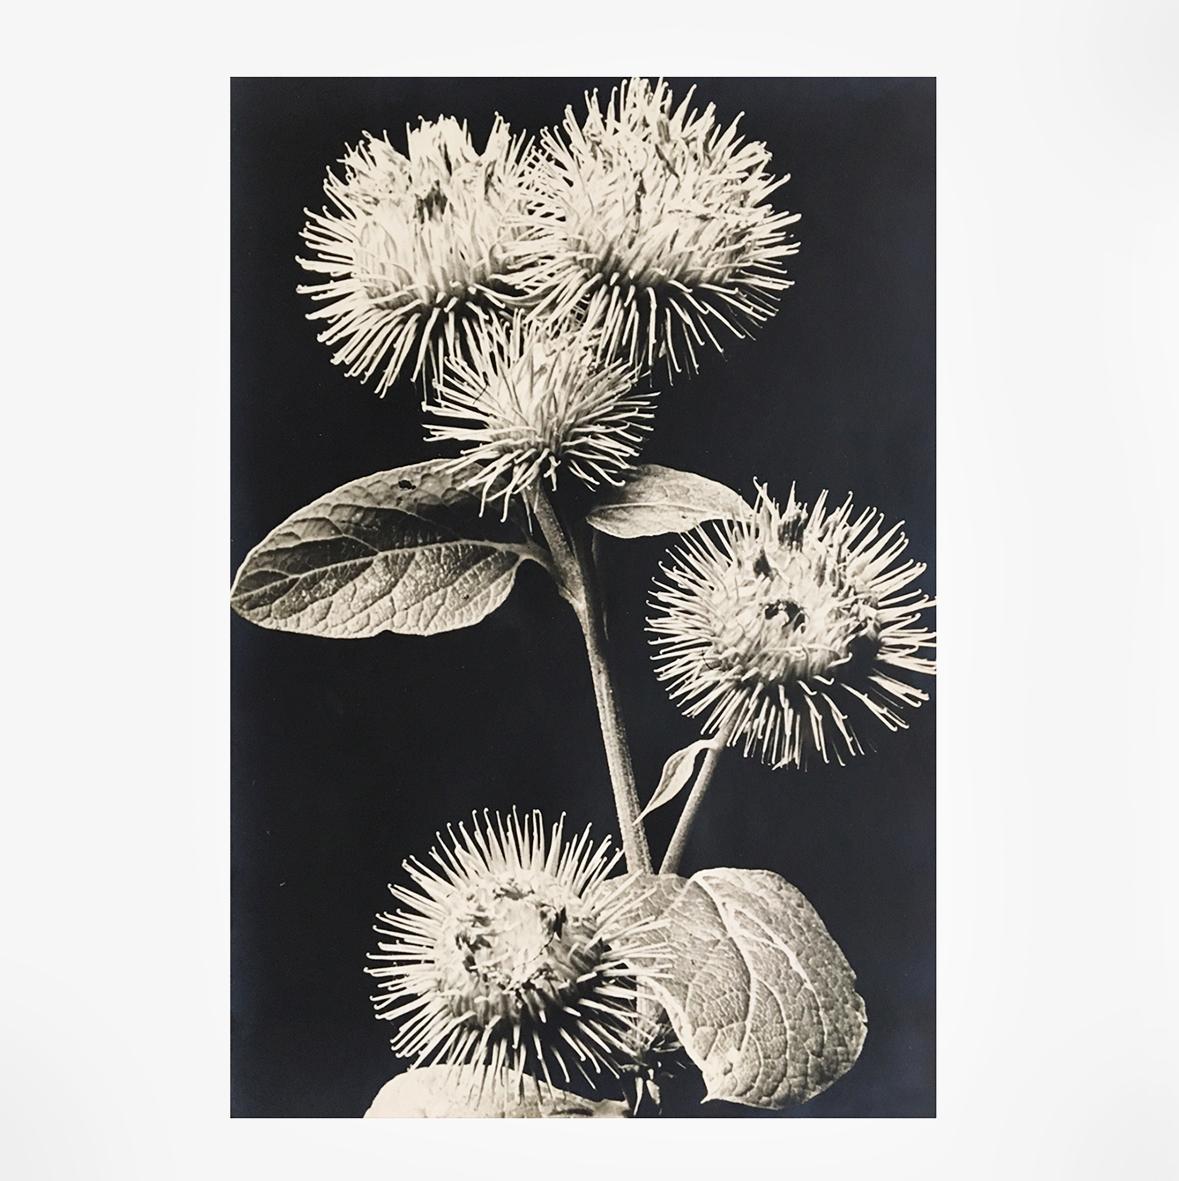 Dr. Paul Wolff & Alfred Tritschler | Klettenblüte | Photography, silver gelatin print | Germany | 1931 | basedonart gallery